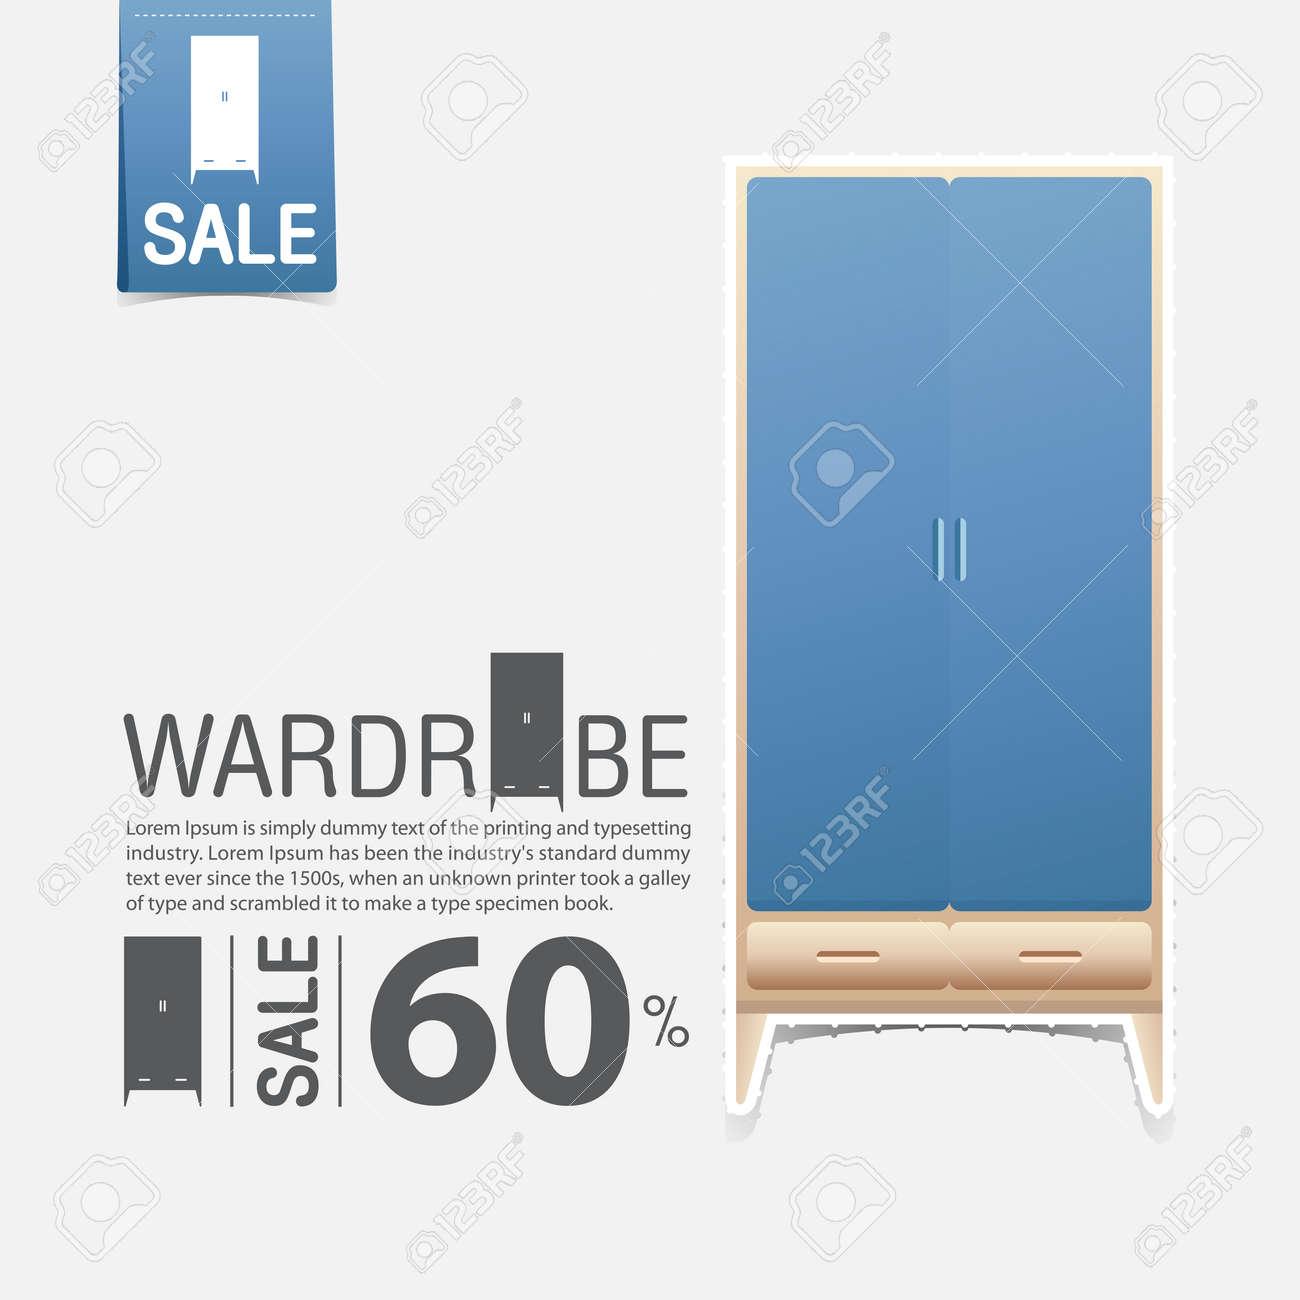 Awe Inspiring Wardrobe In Flat Design For Home Interior Minimal Icon For Furniture Inzonedesignstudio Interior Chair Design Inzonedesignstudiocom